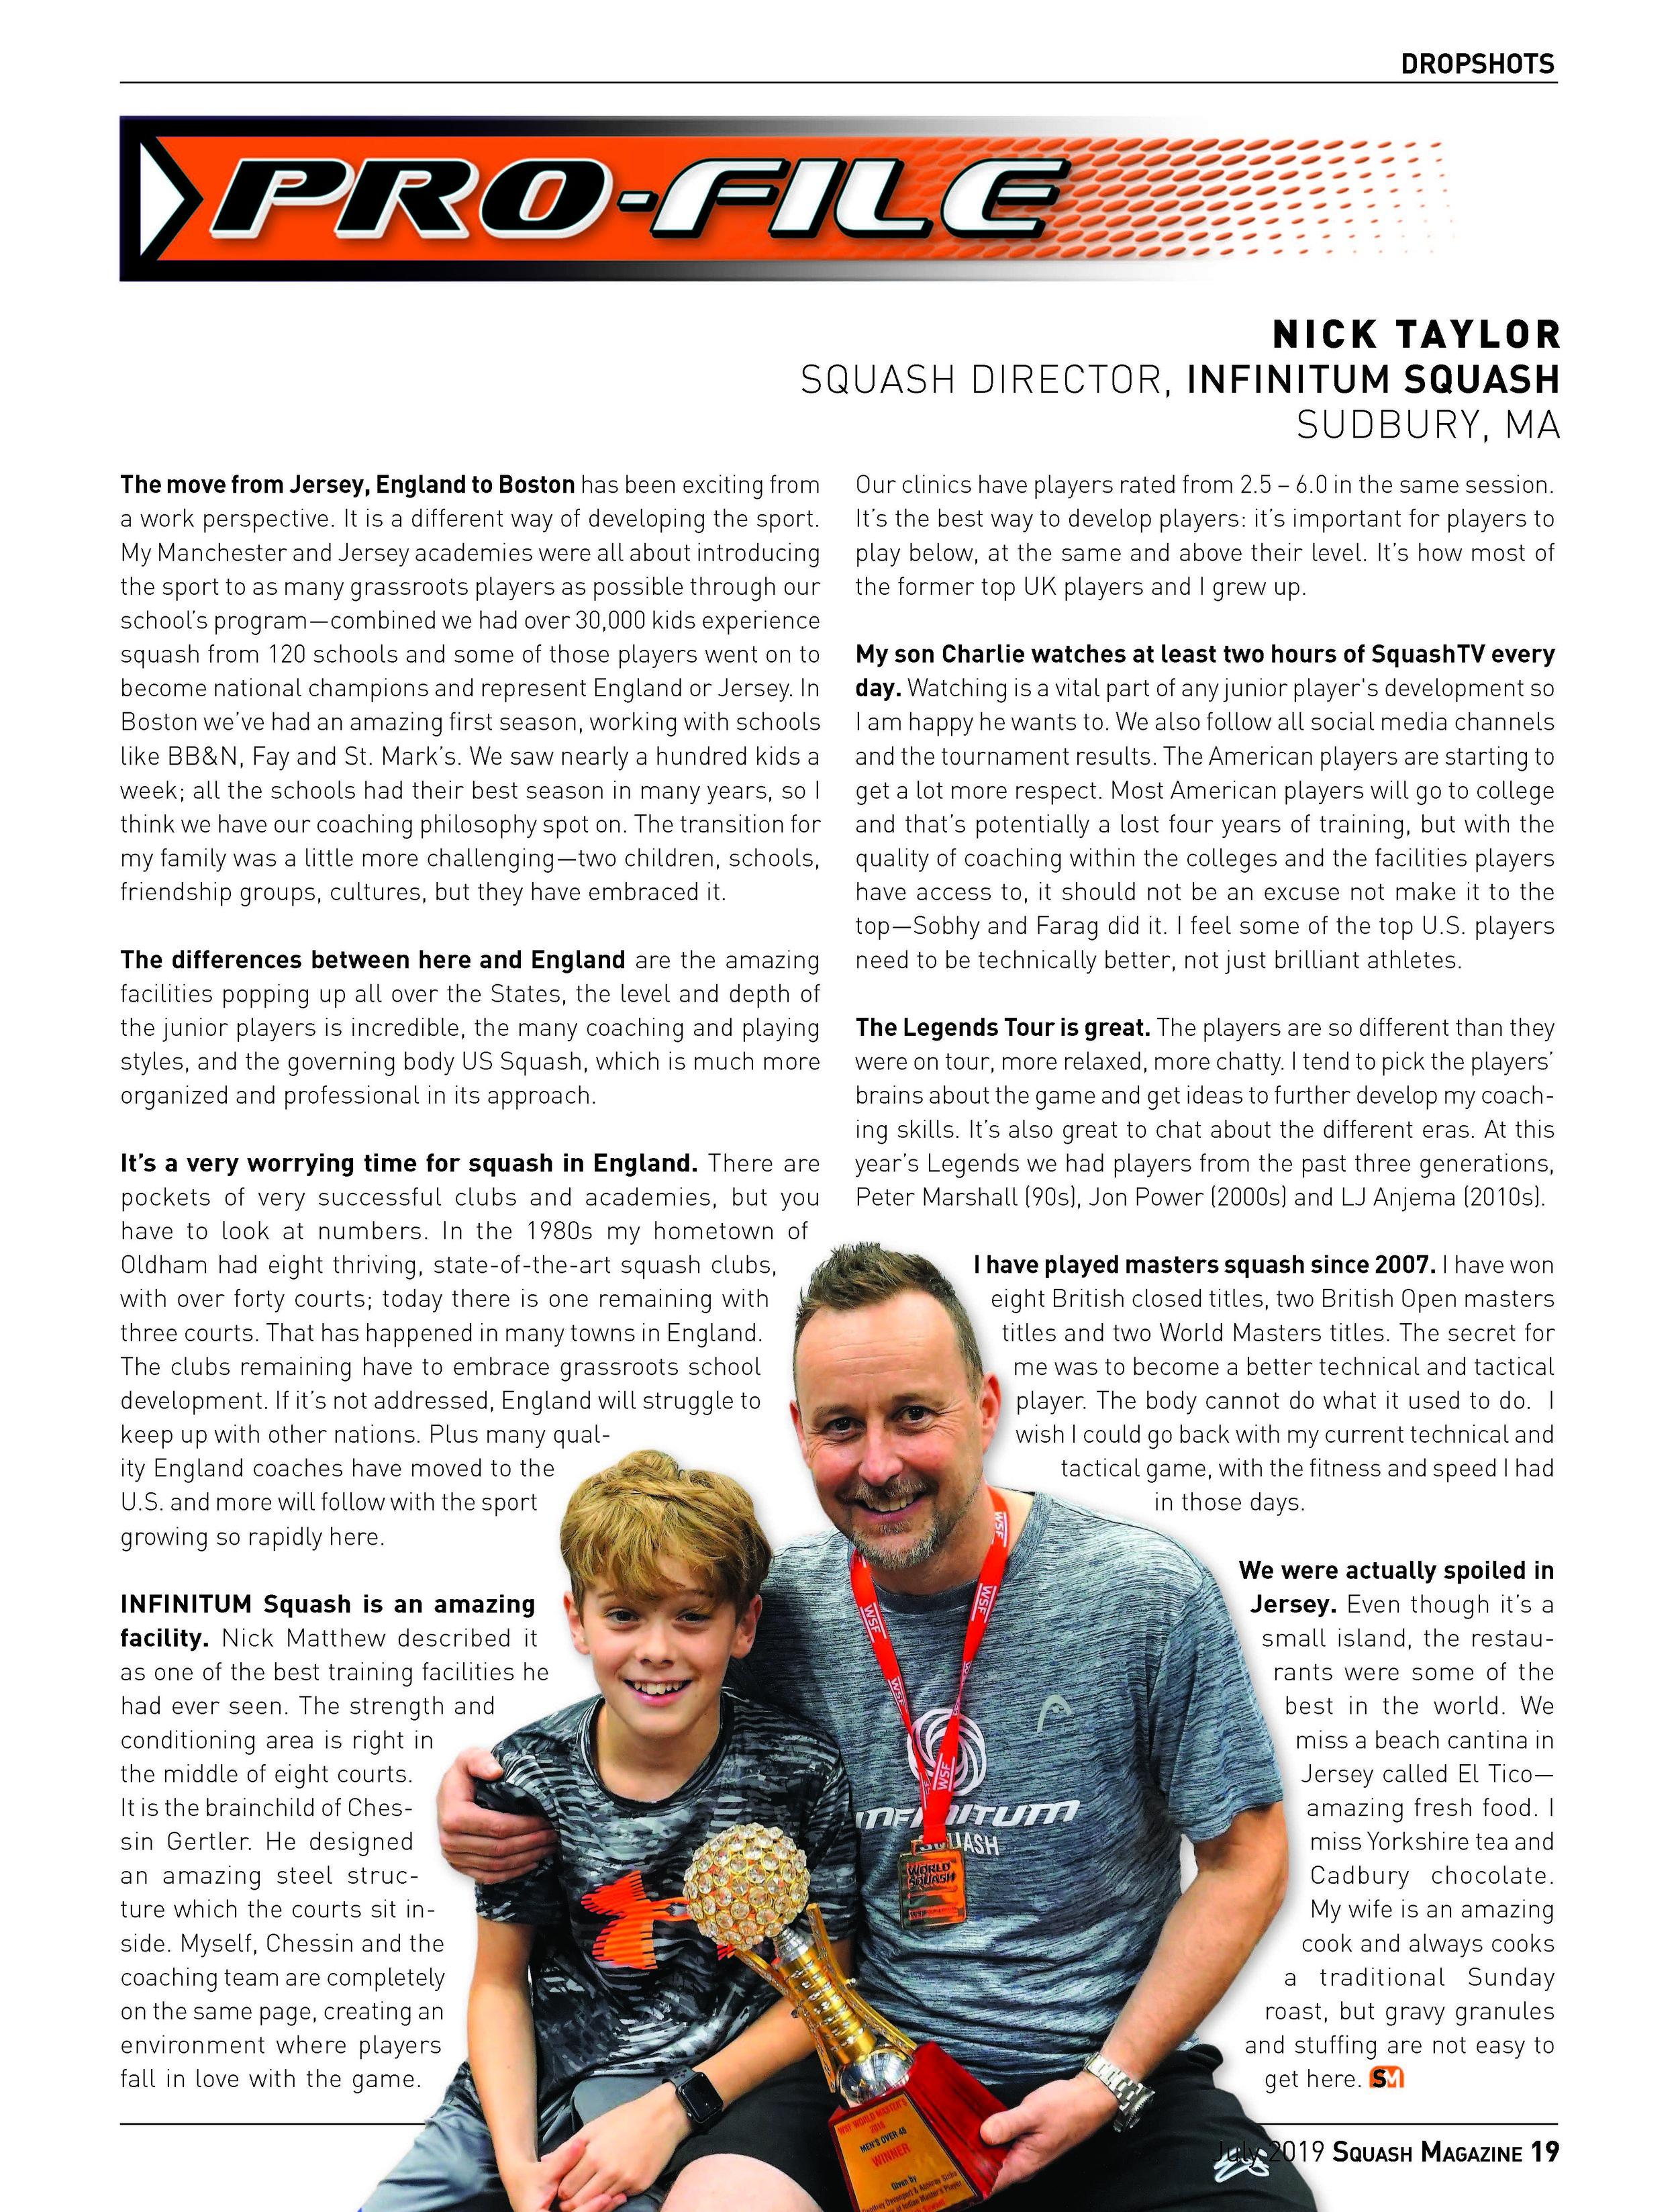 nick taylor infinitum squash squash magazine interview.jpg